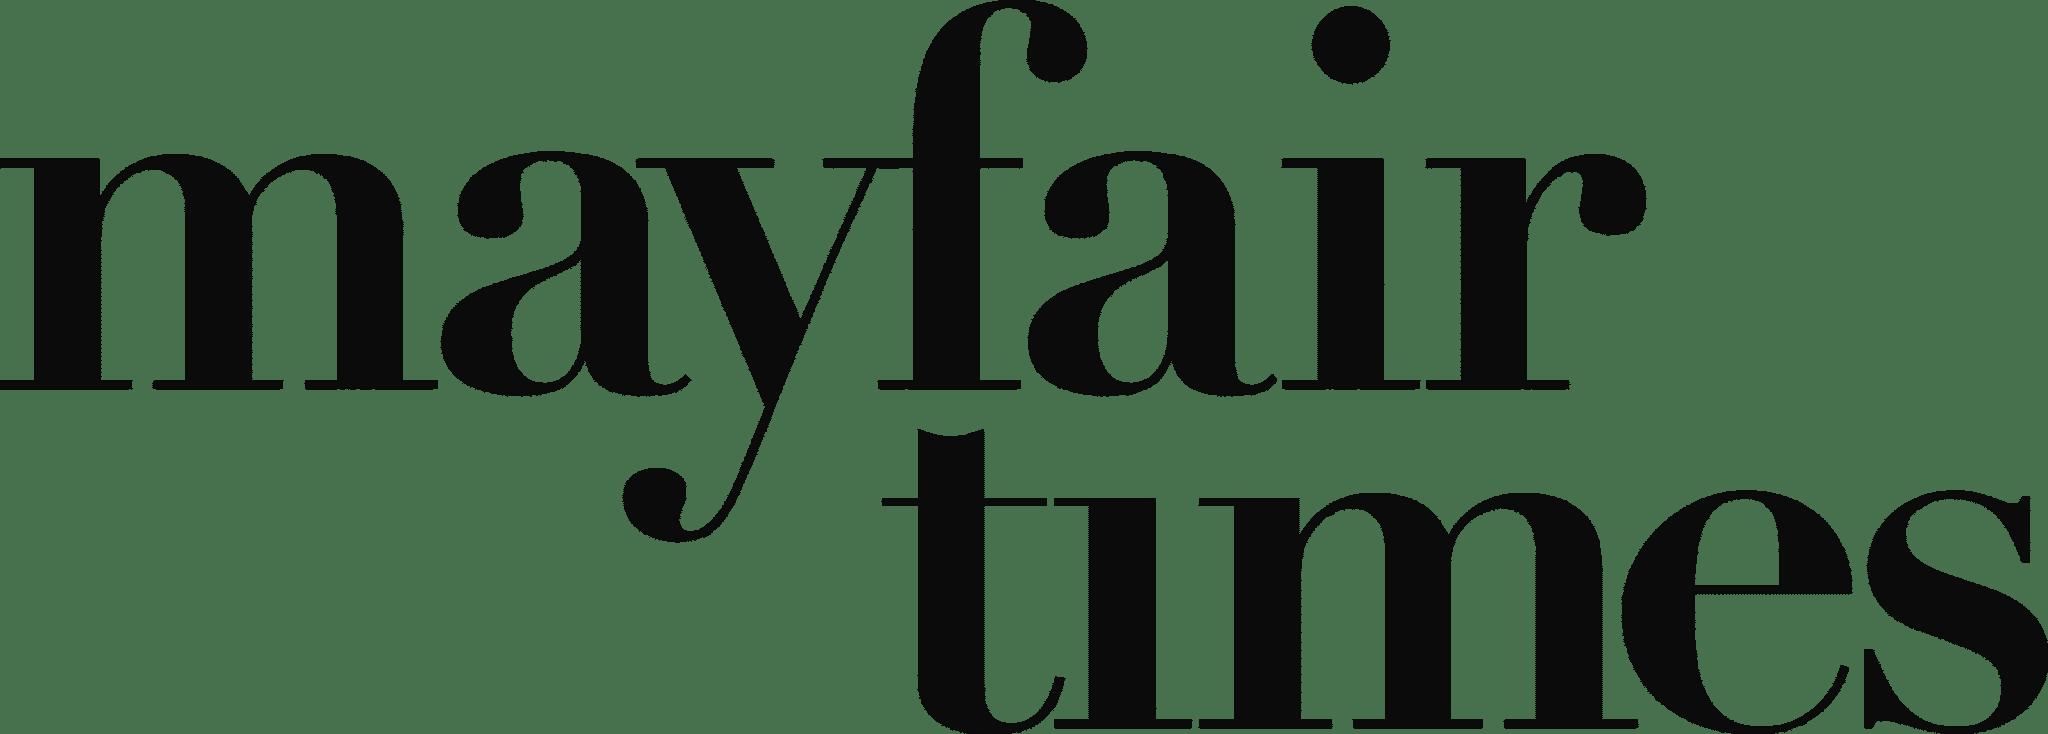 mayfair times logo